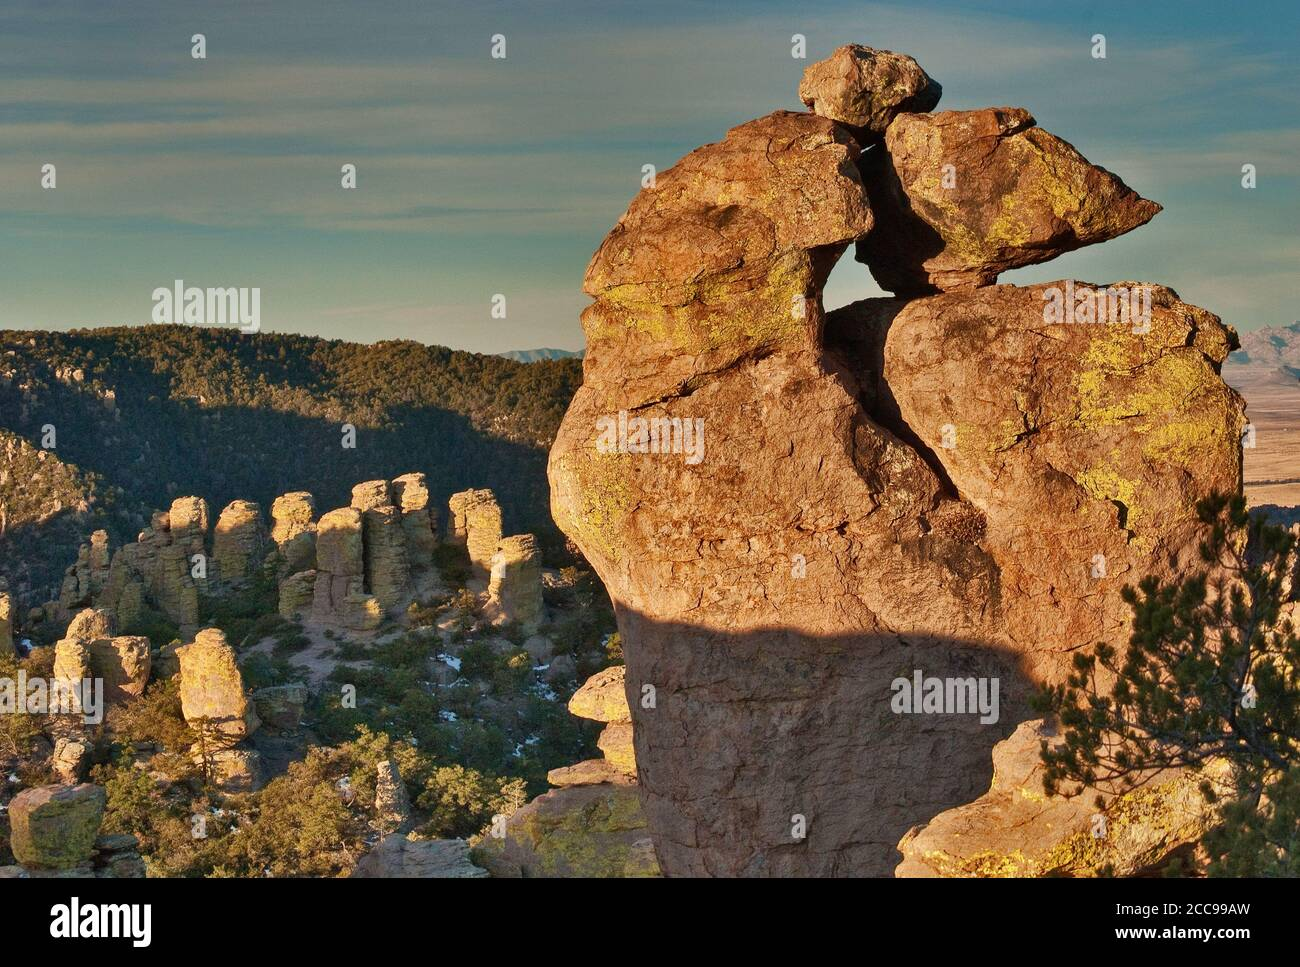 Rocks at Massai Point at Chiricahua National Monument, Arizona, USA Stock Photo